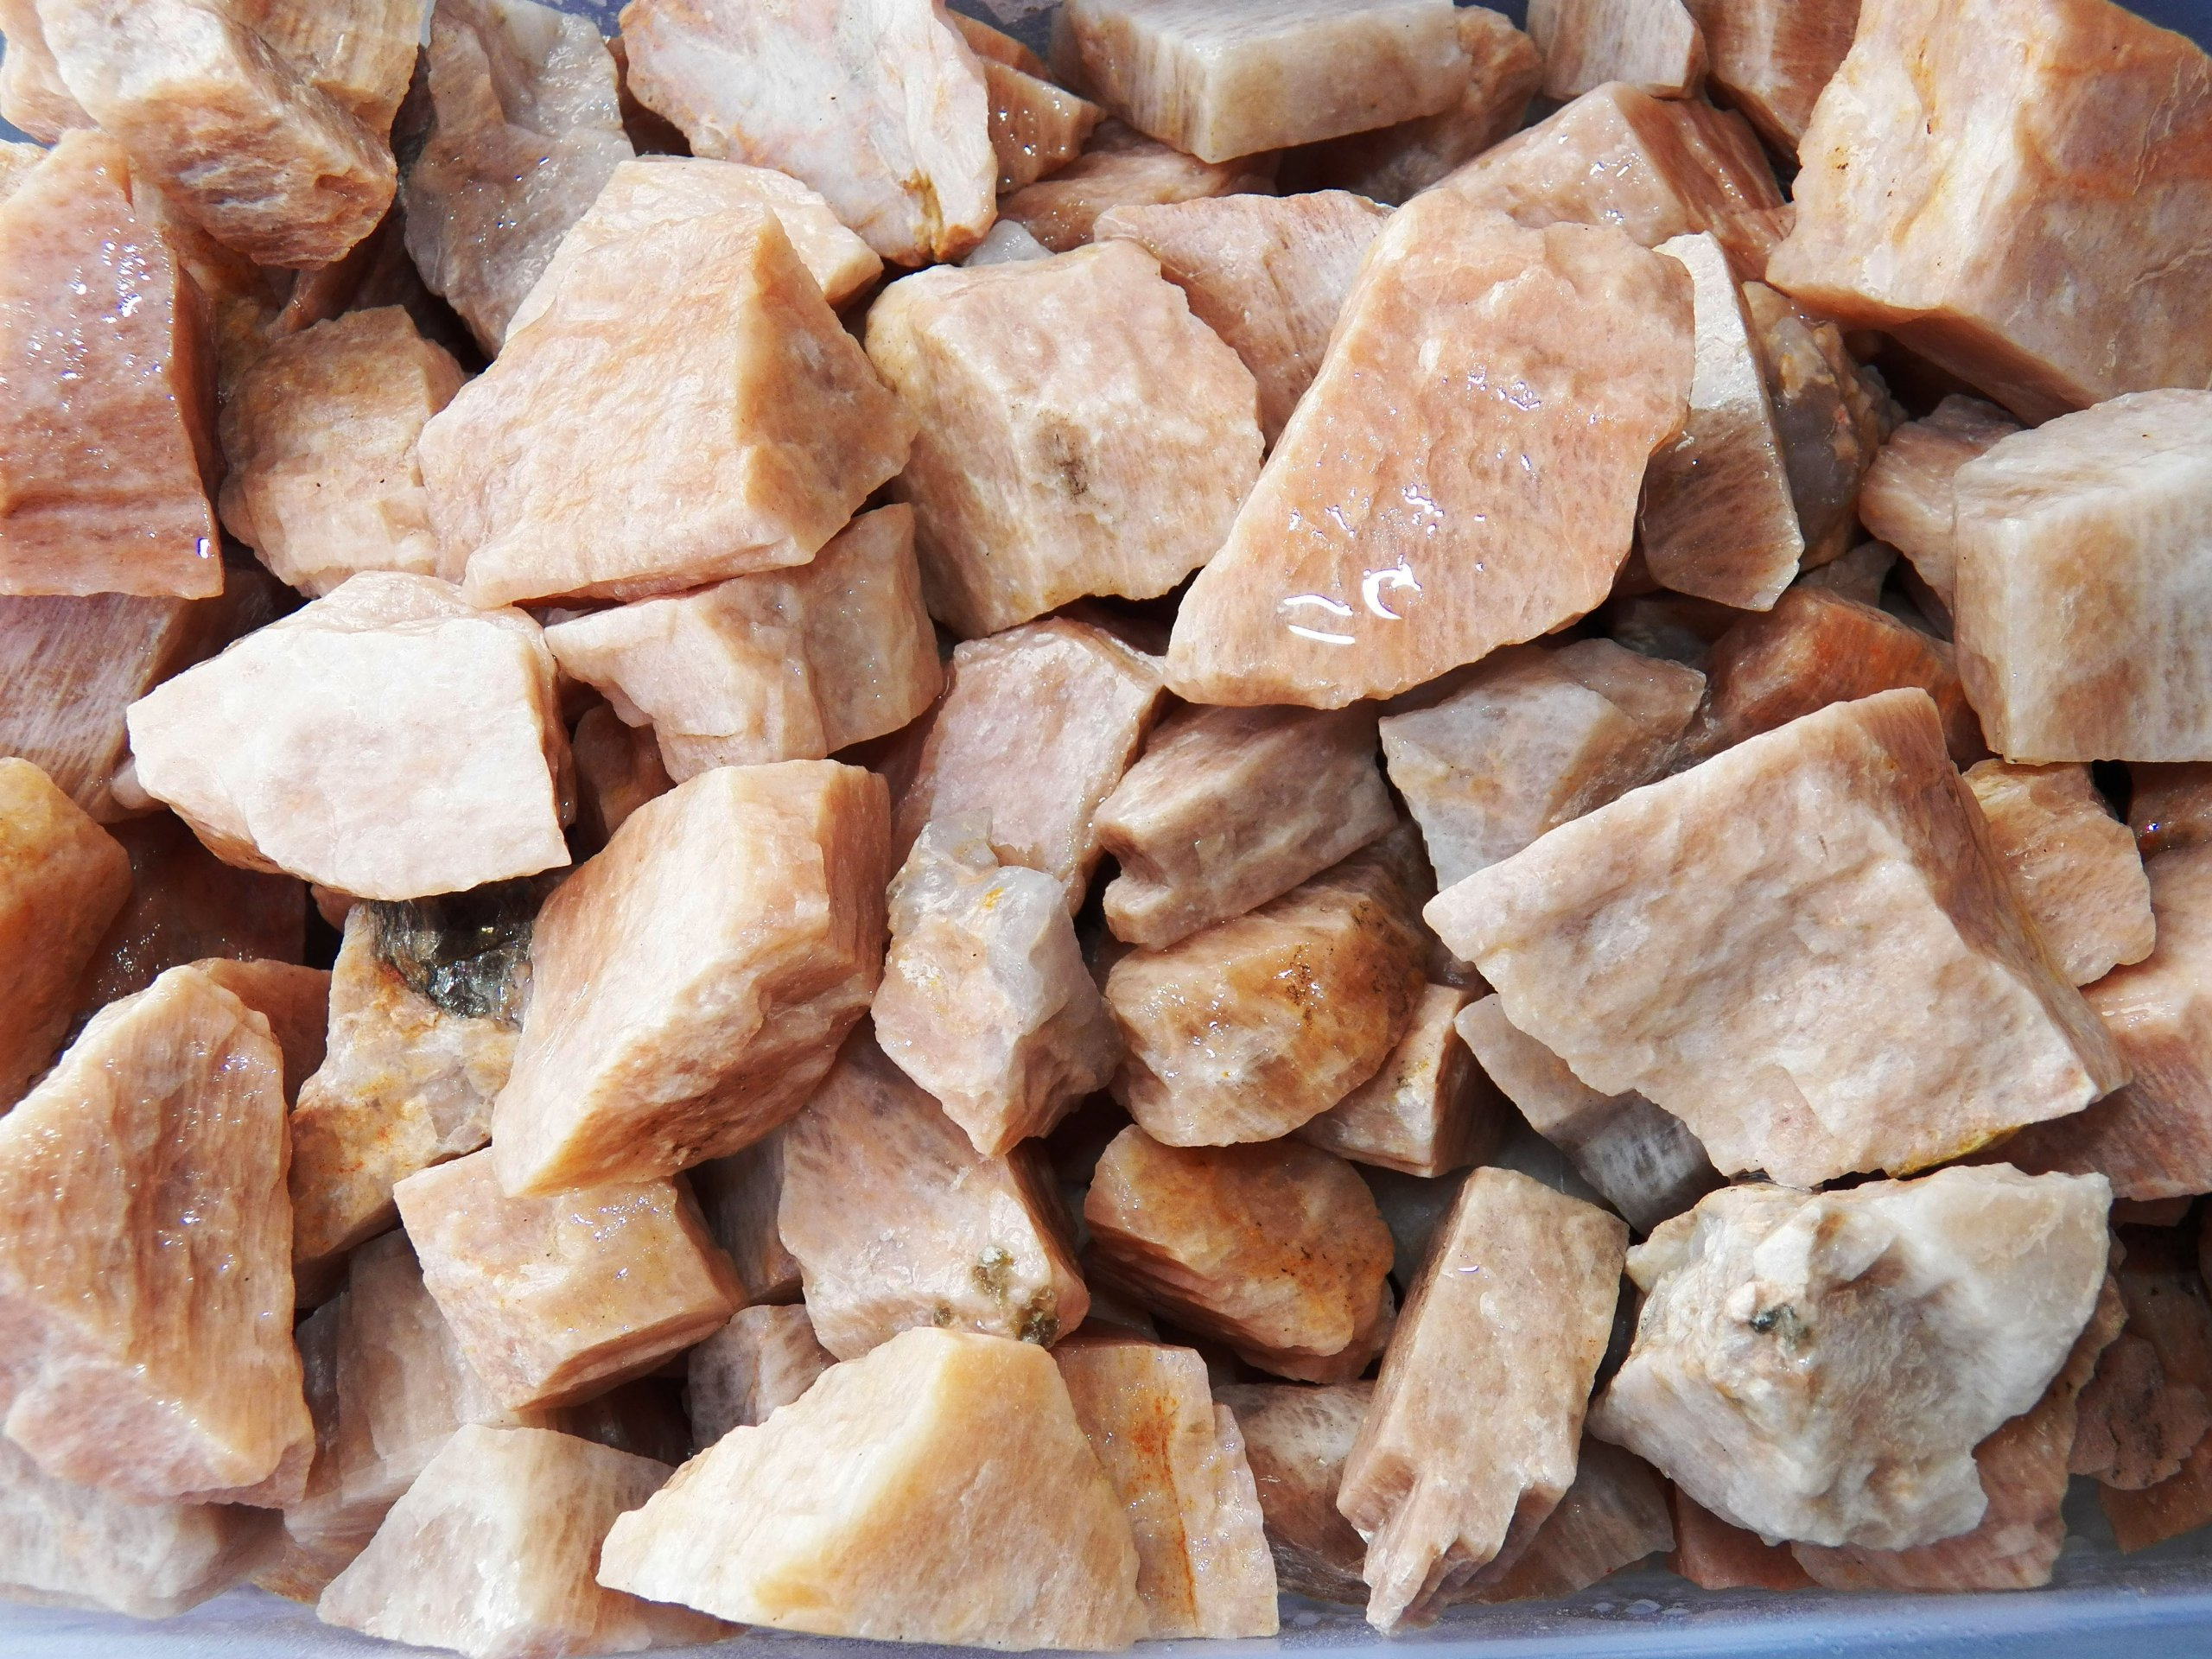 Large Fundamental Rockhound Products: One Dark Peach Moonstone from India Tumbled Stone Gemstone Crystal 8.1-15 g 1